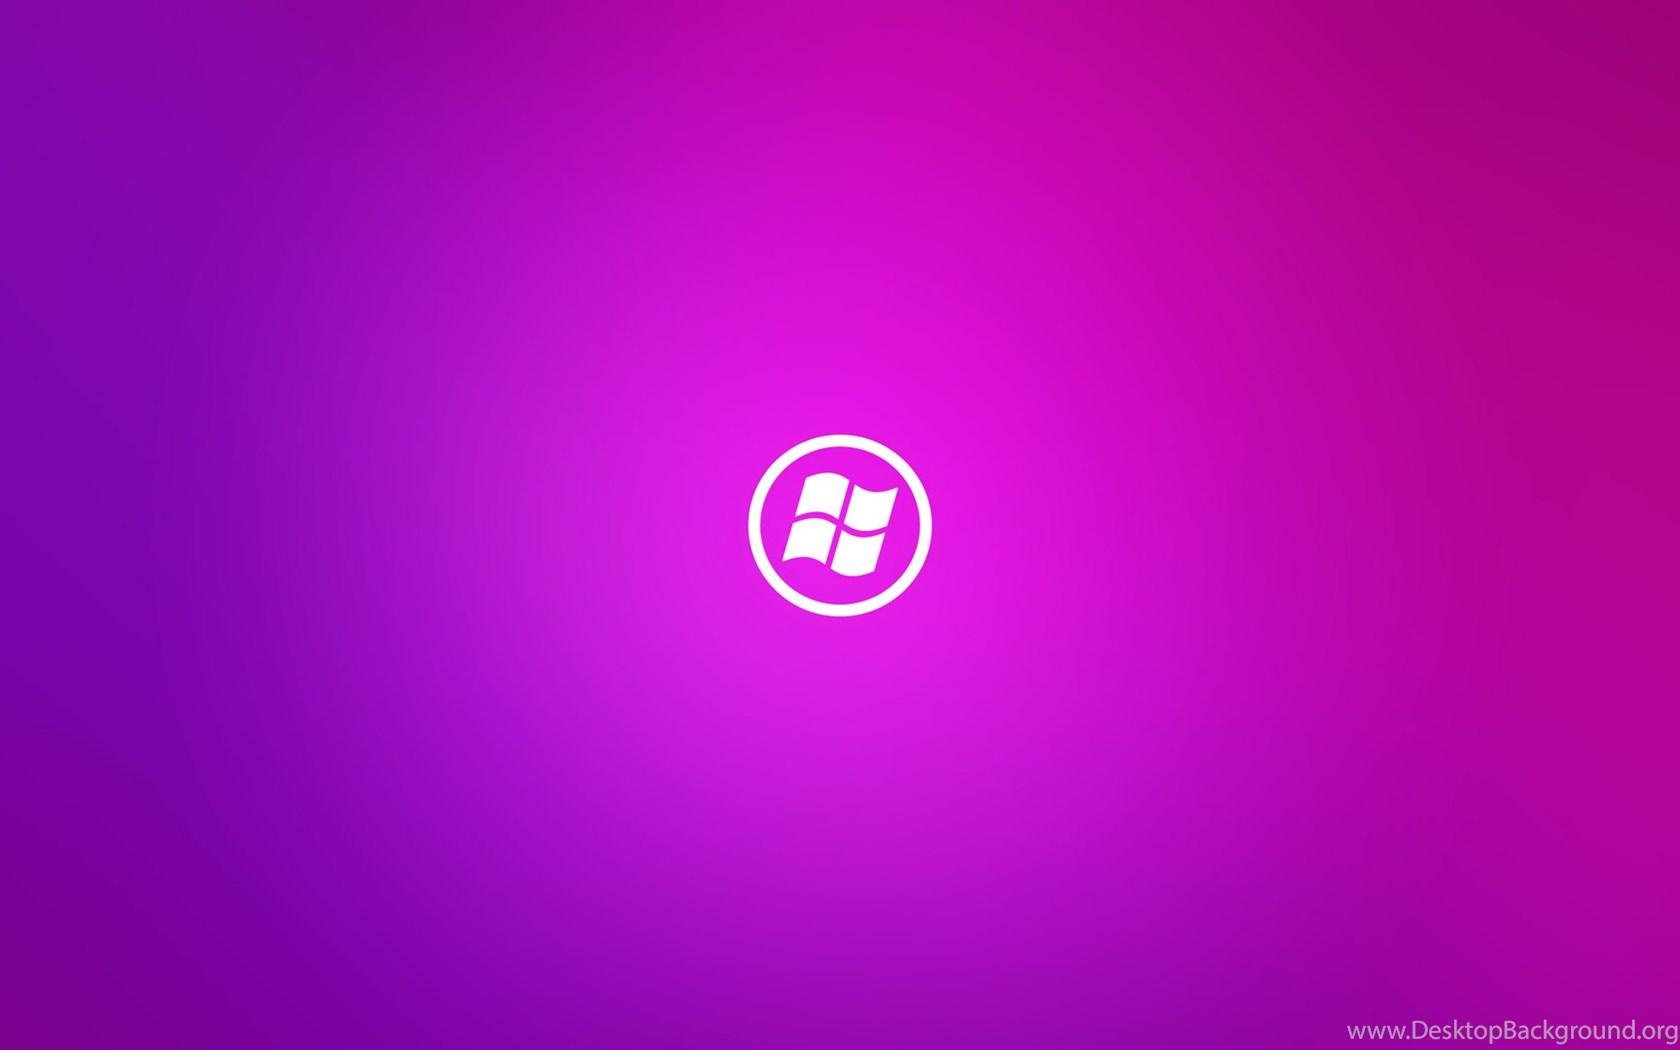 windows 8 official wallpapers purple desktop background